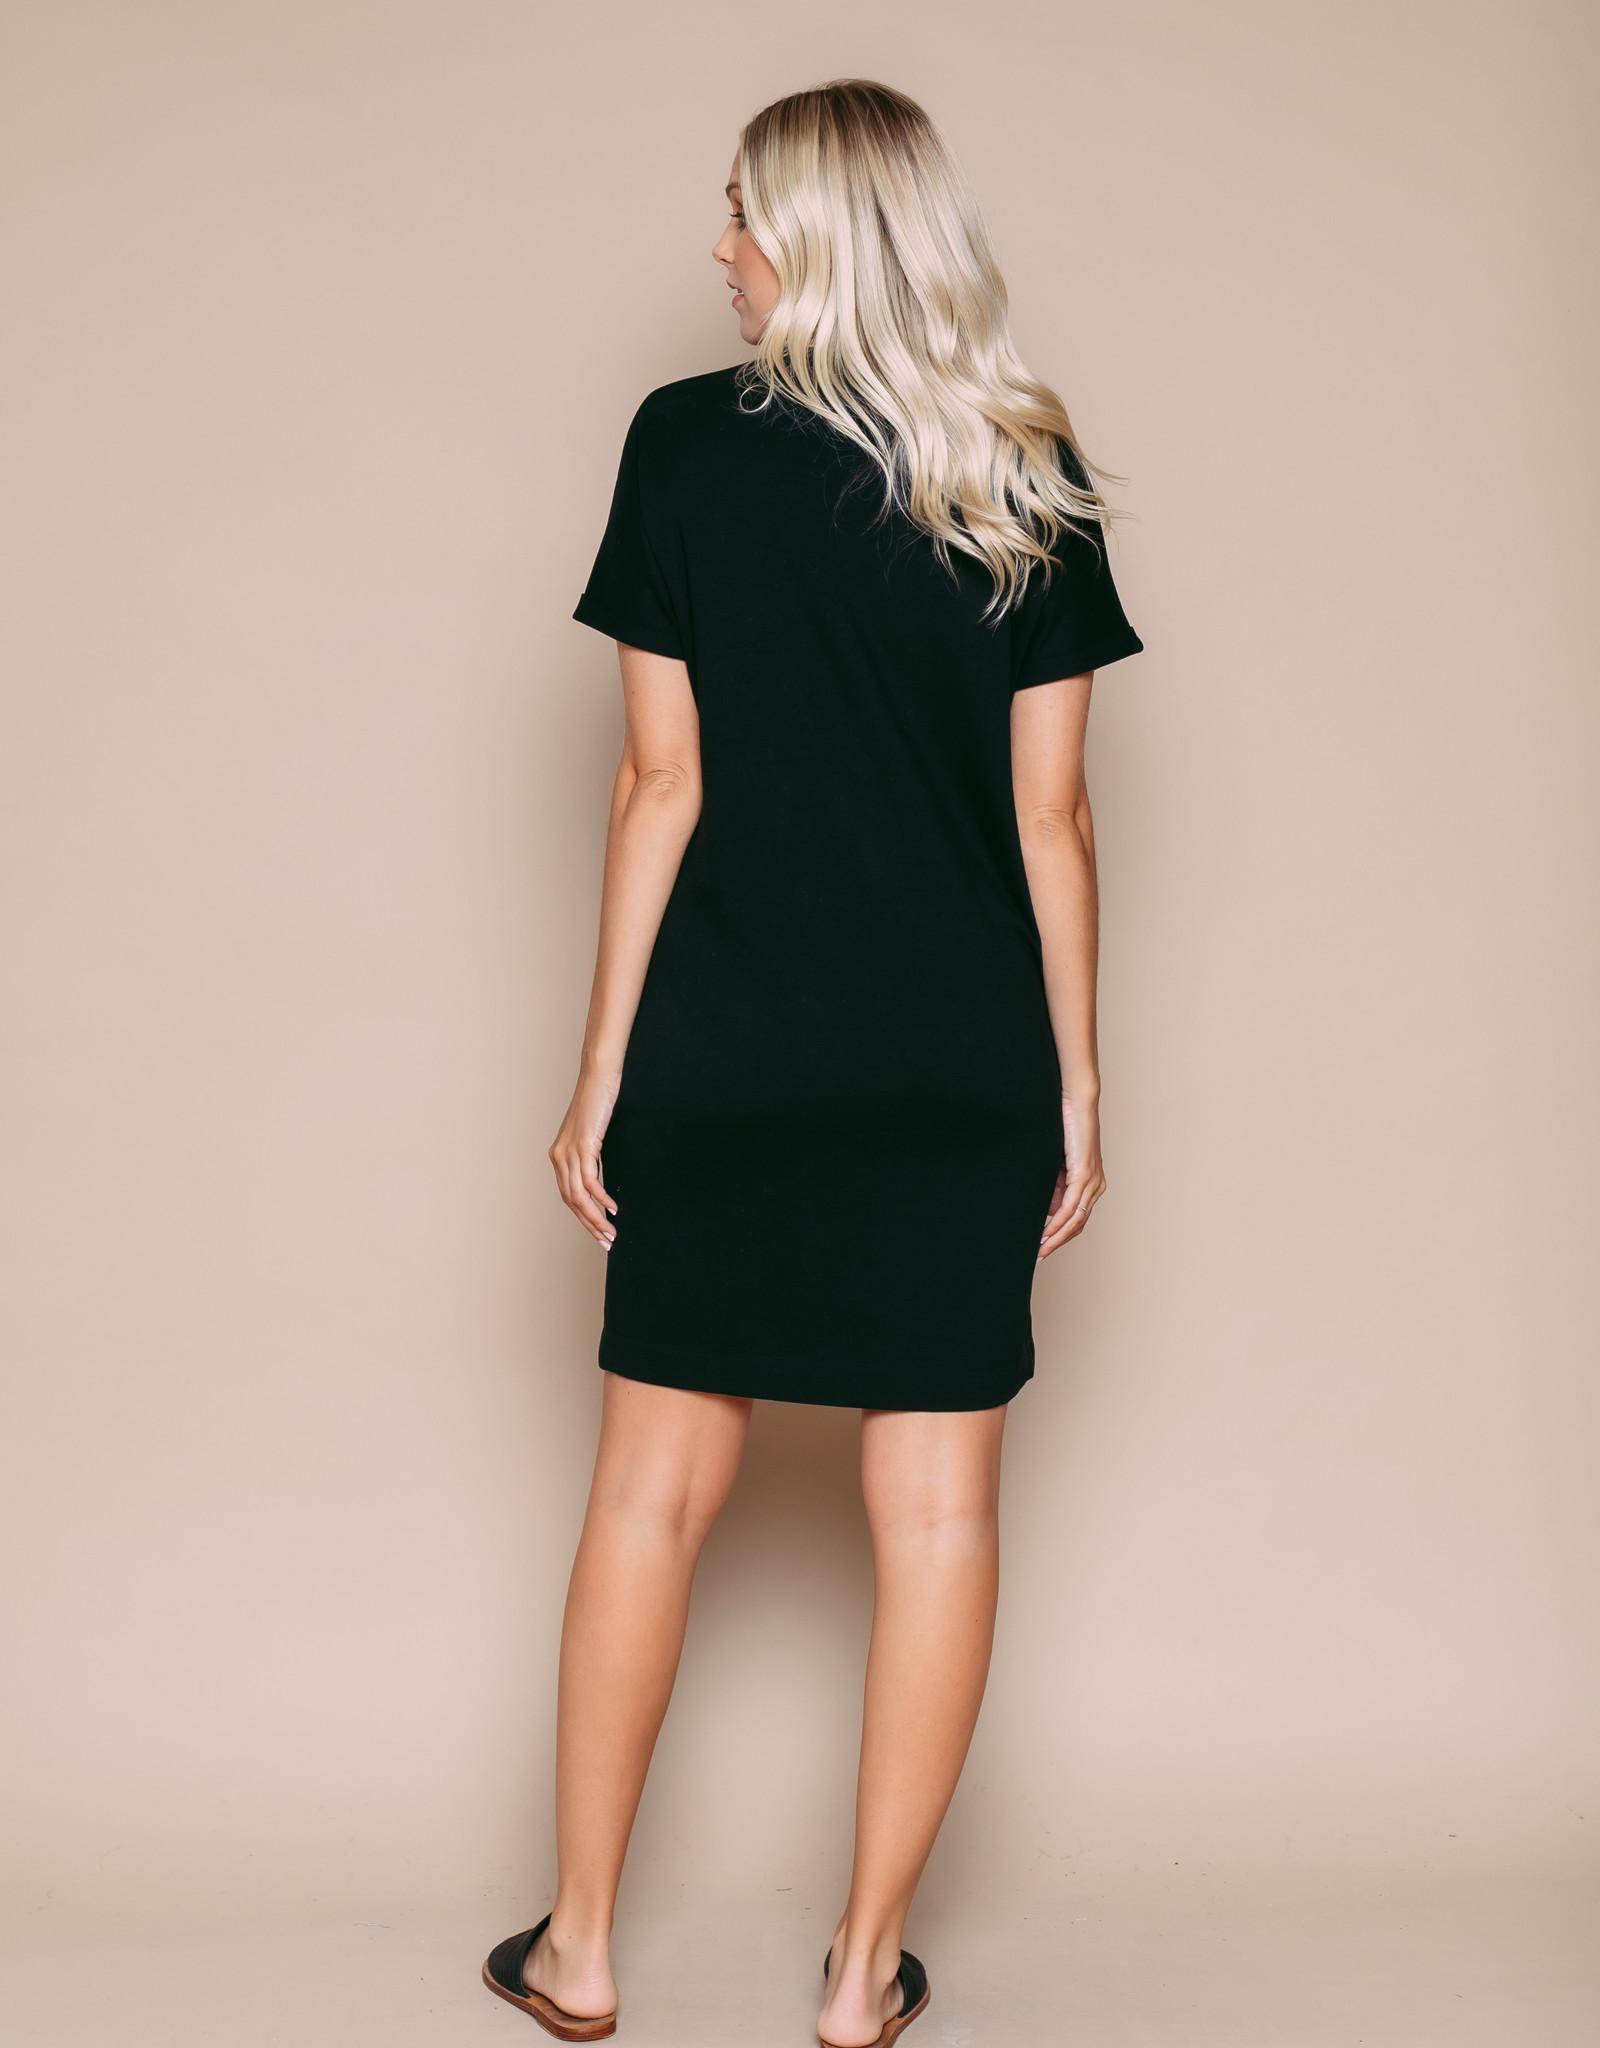 Orb Clothing Laney Dress Black